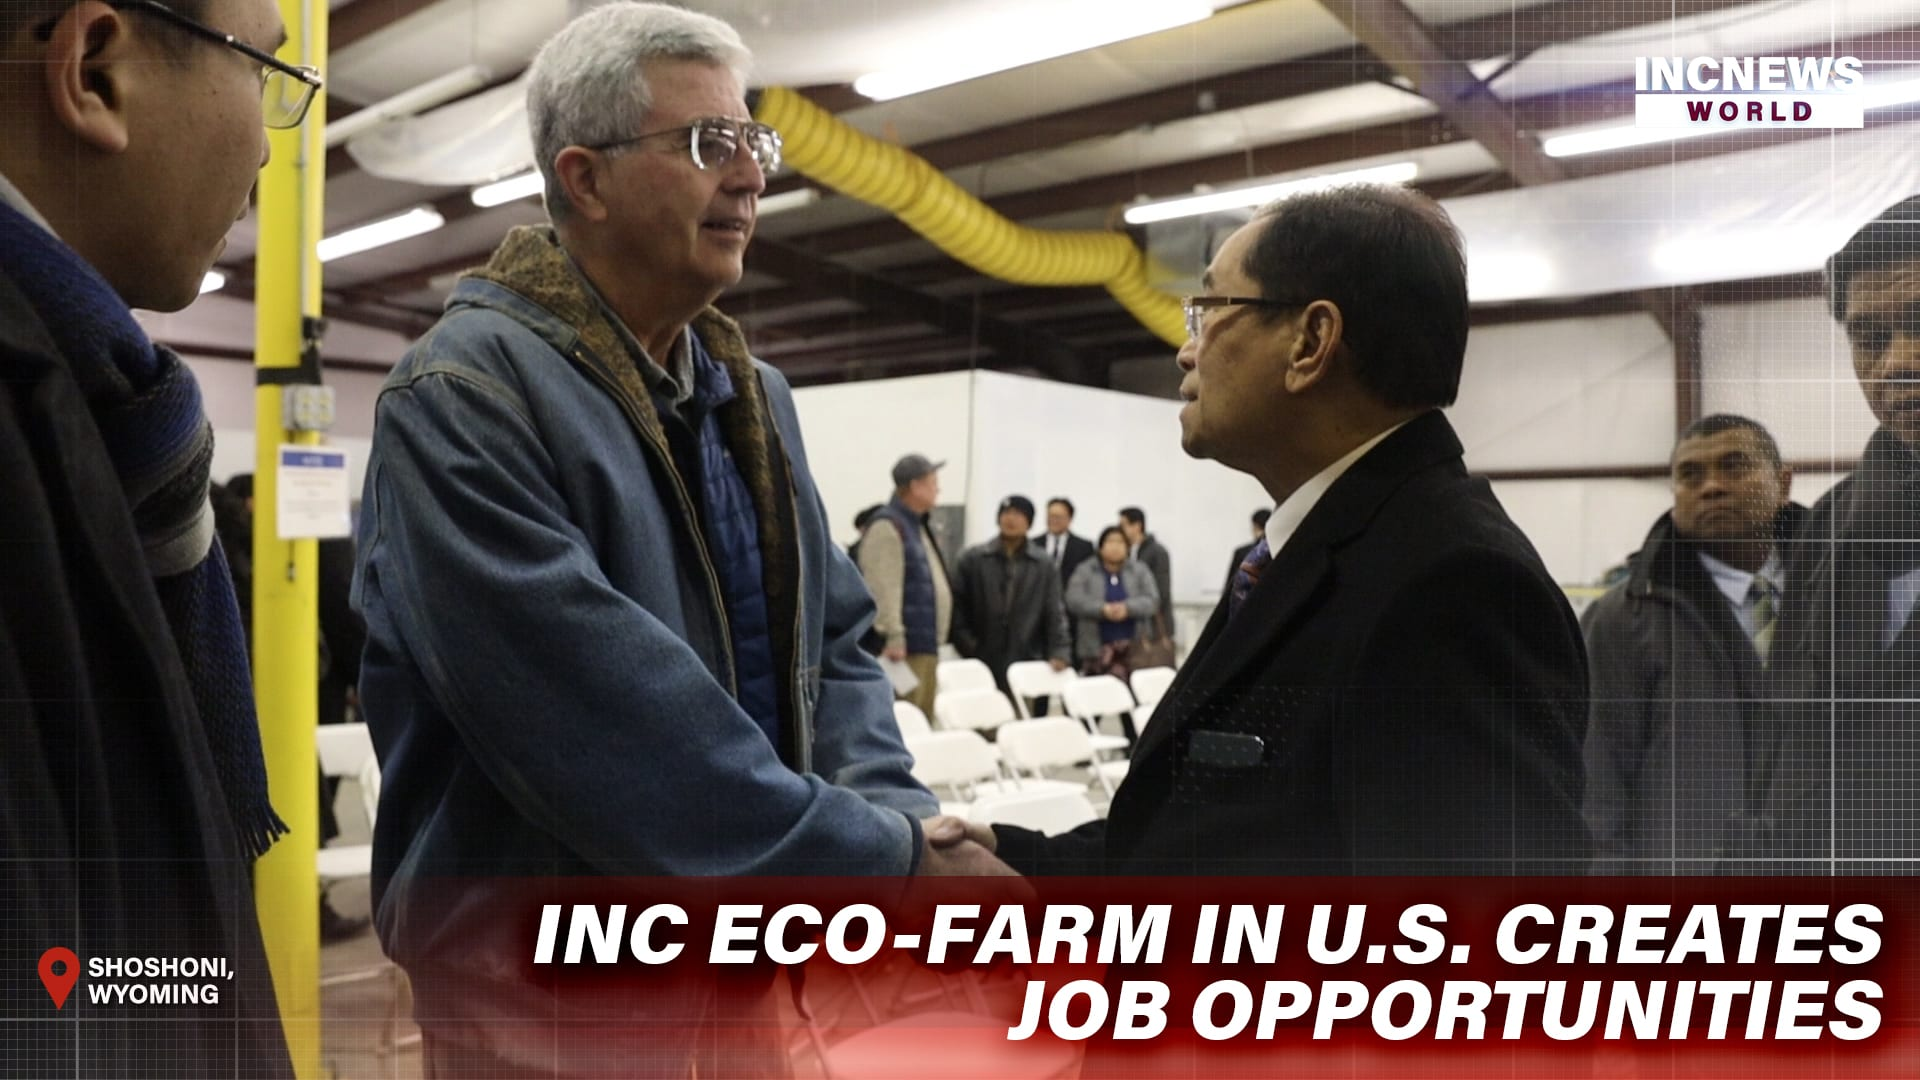 INC Eco-farm in US Creates Job Opportunities